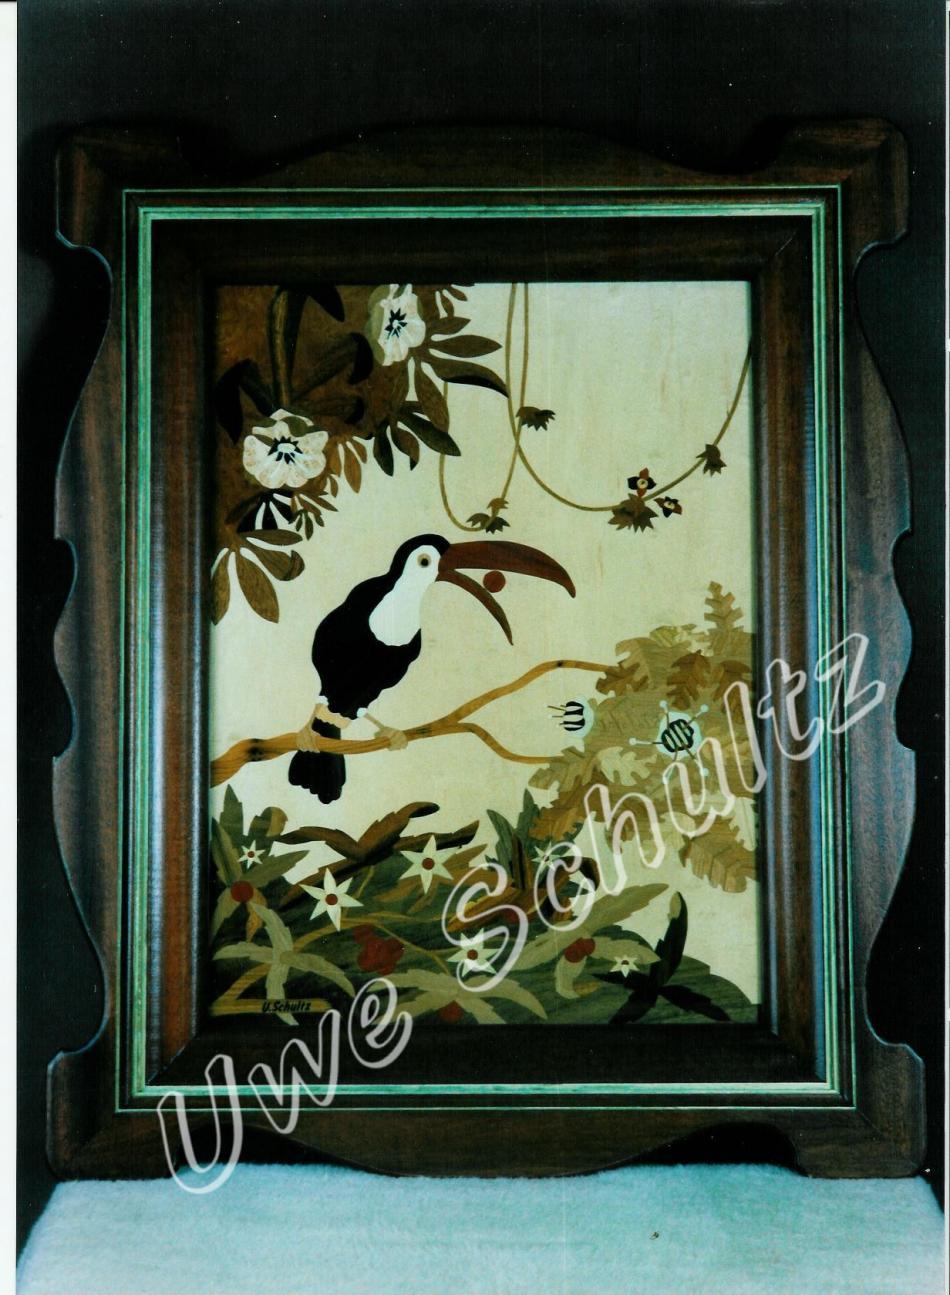 Tucan - Intarsienarbeit